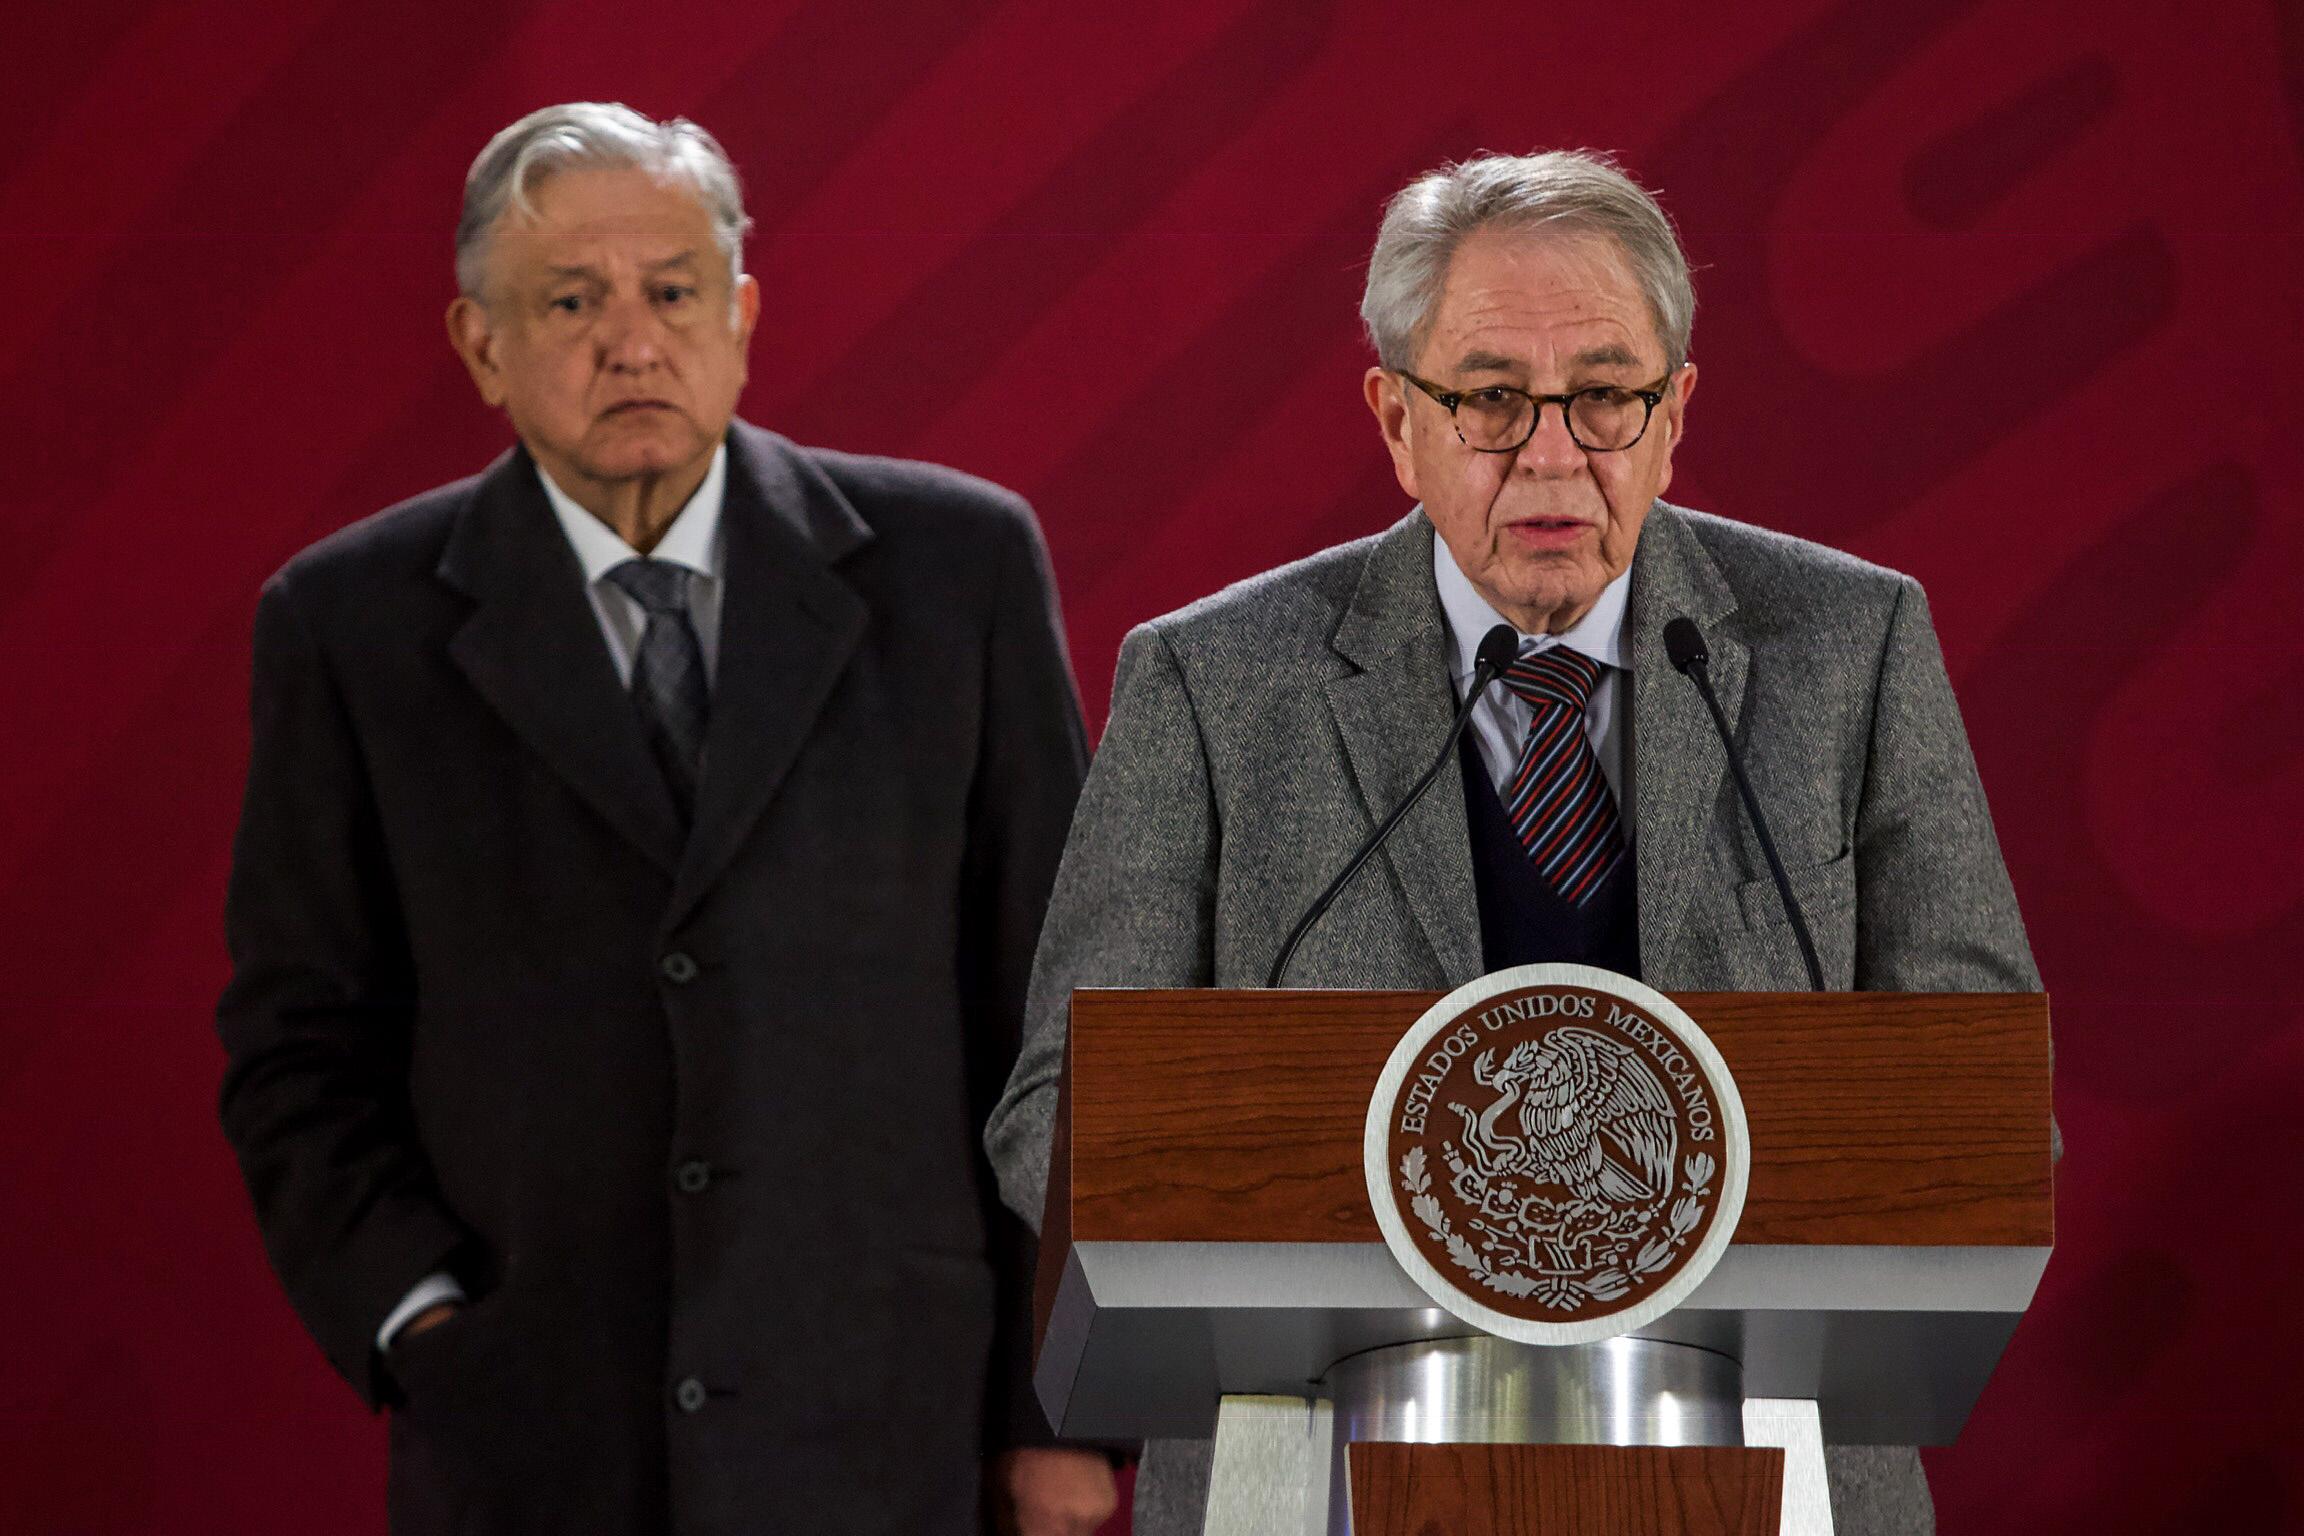 Jorge Alcocer, Tlahuelilpan